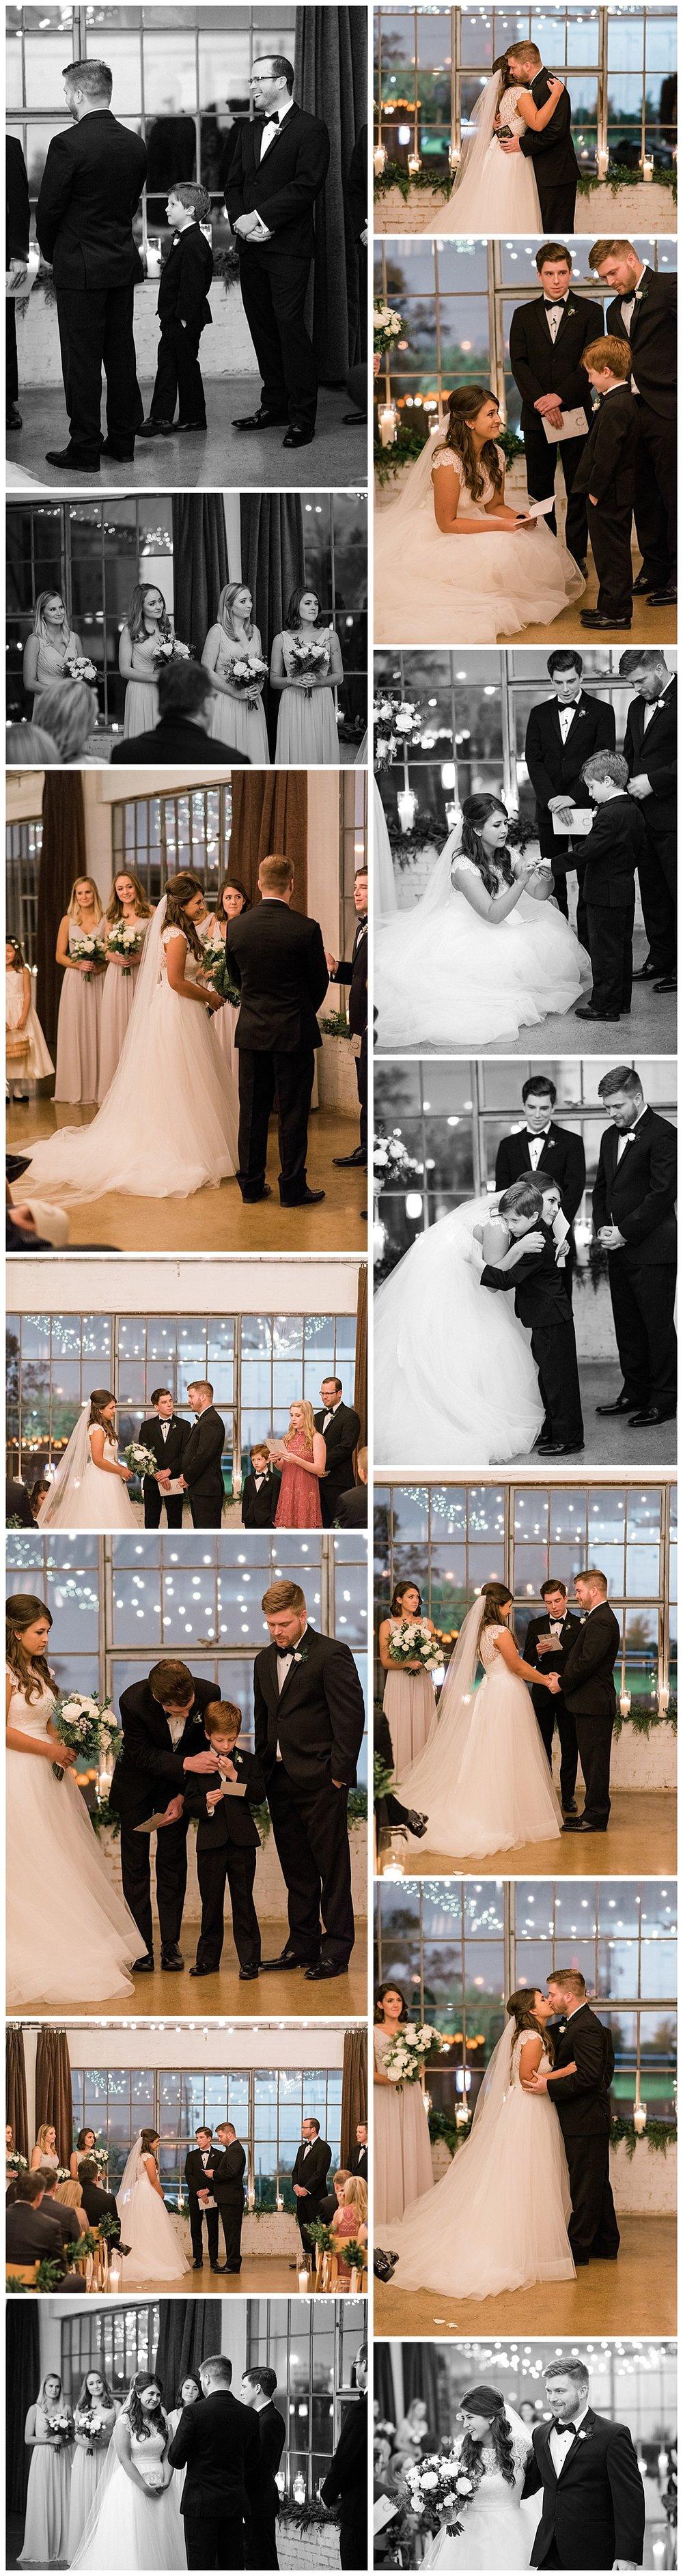 hickory-street-annex-wedding-ar-photography-12.jpg